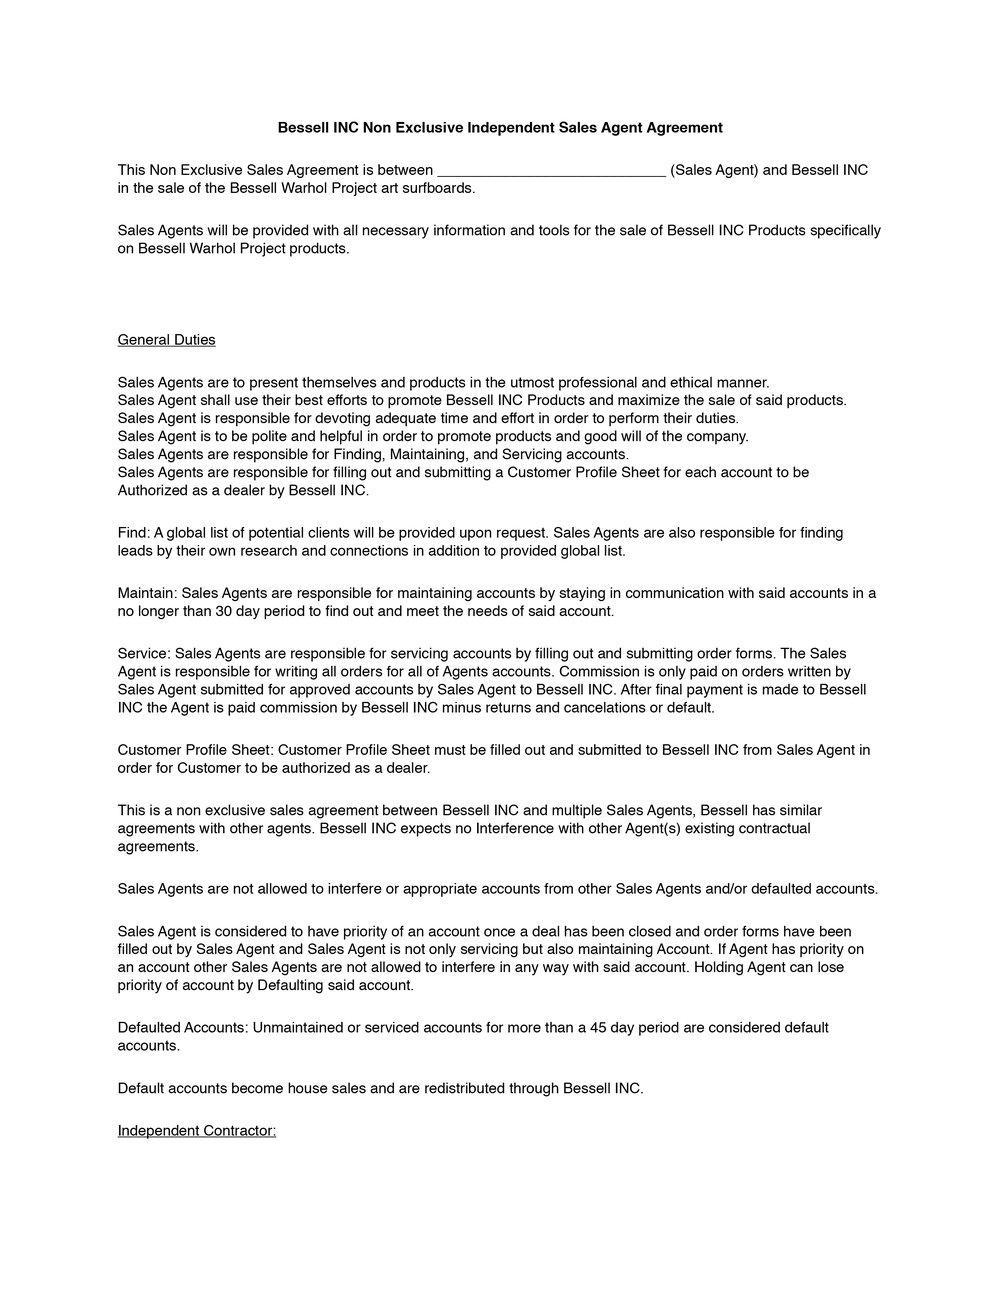 BessellWarholSalesAgreement 2016-1.jpg